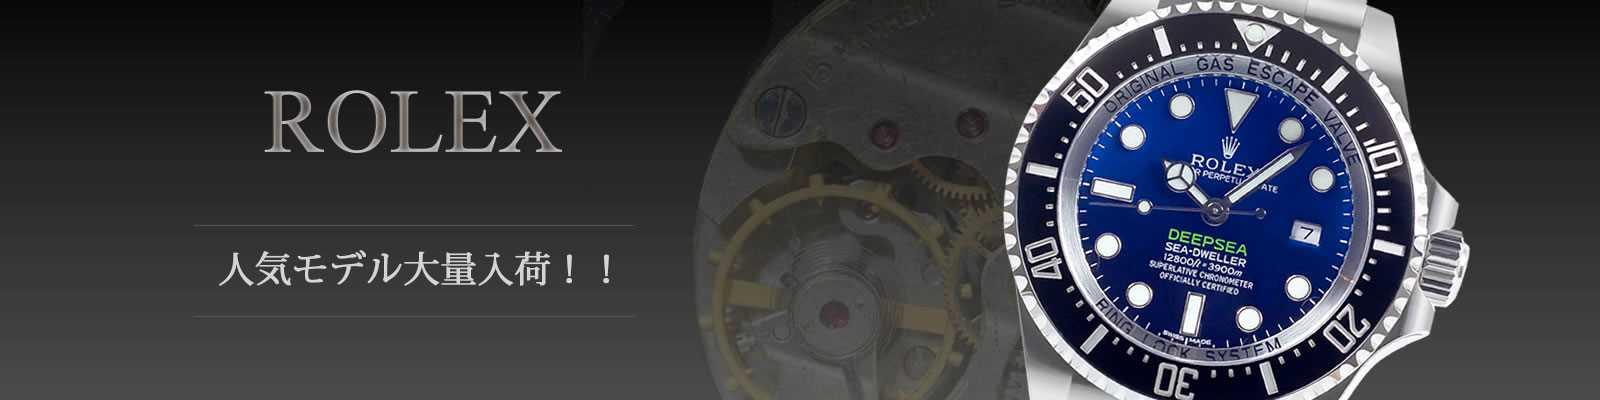 MYWATCH ROLEX 全国最安値に挑戦